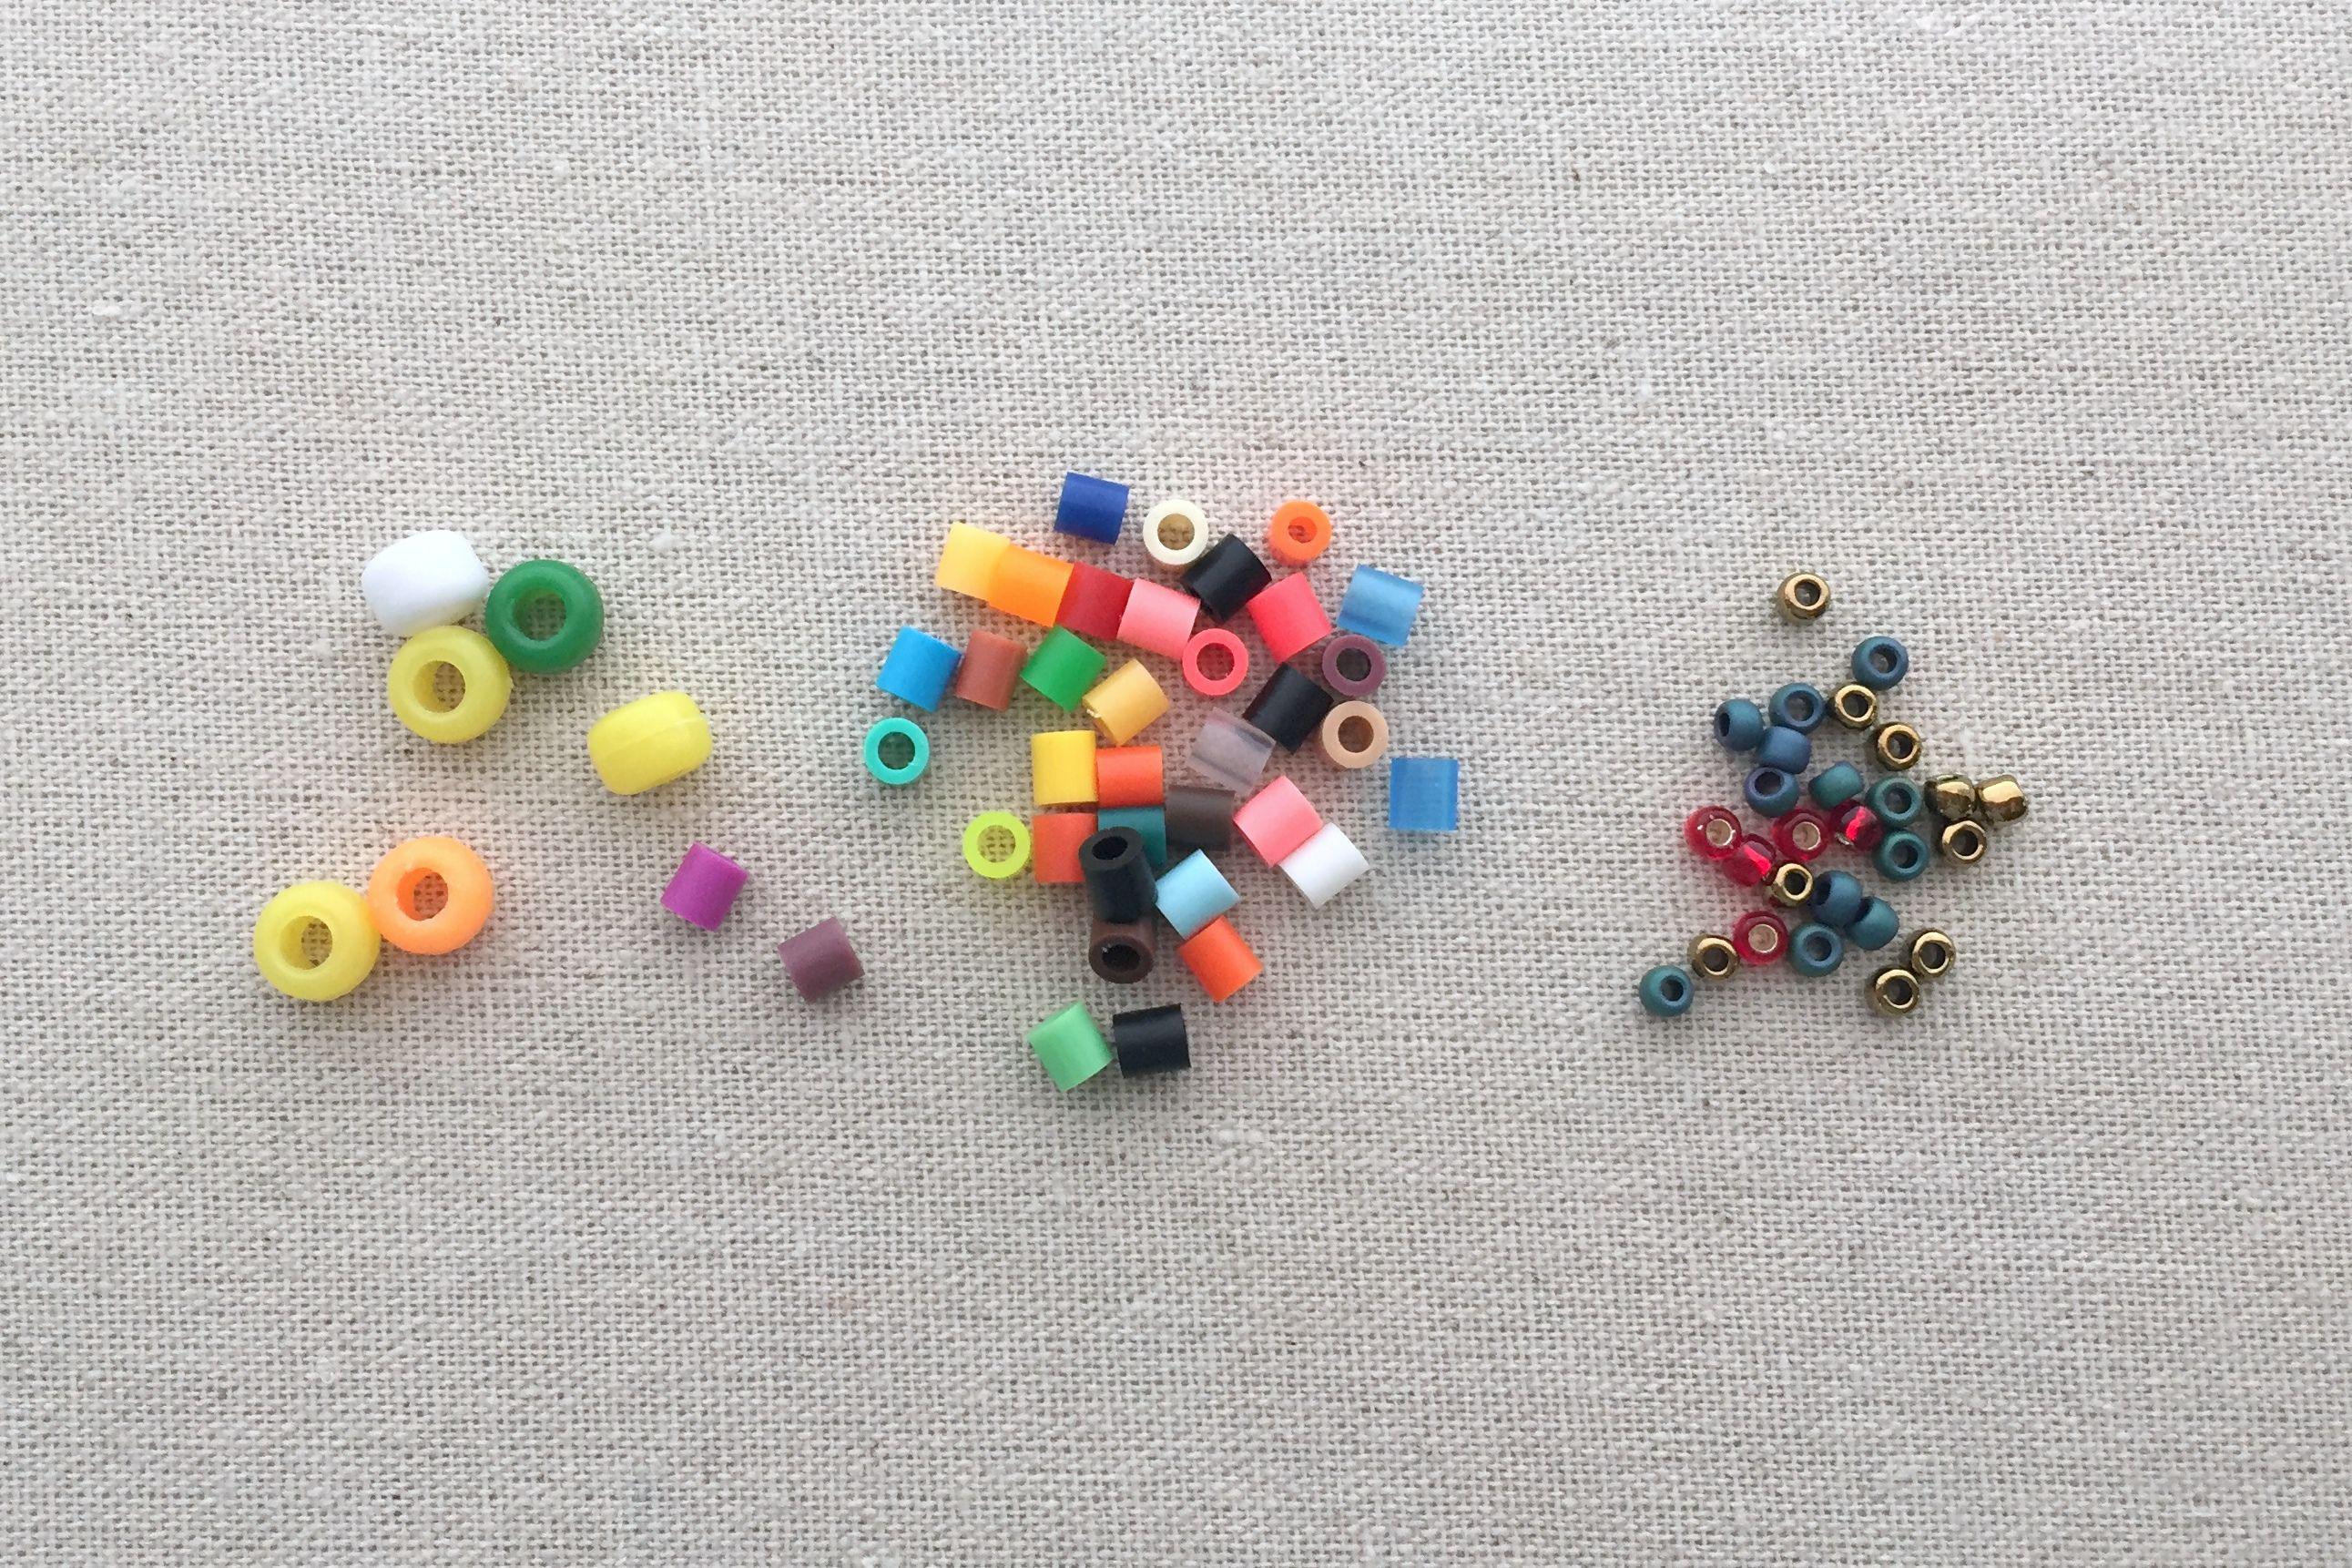 Comparing Perler, Pony and E beads